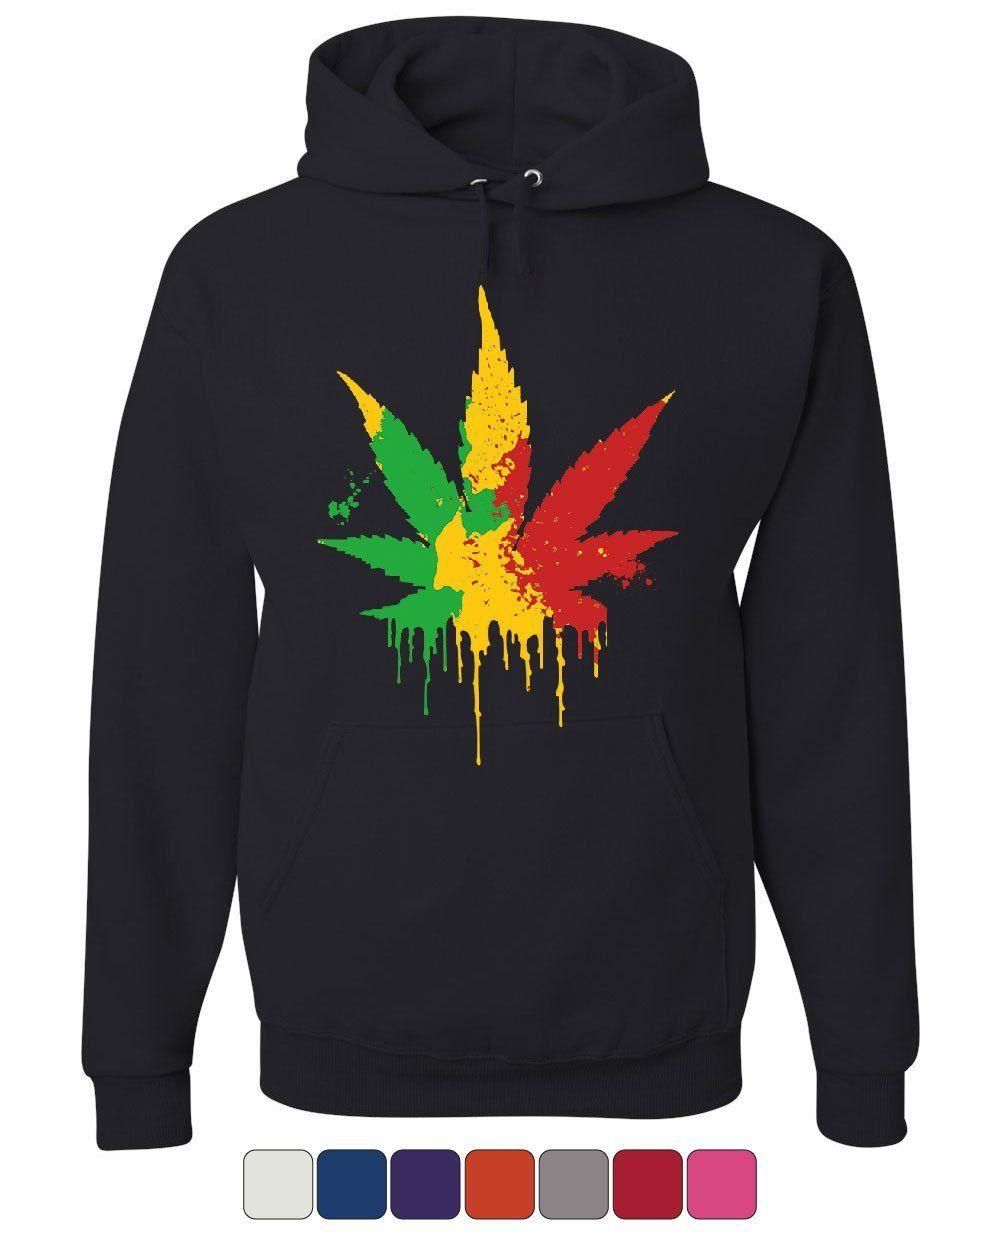 Pot Leaf Rasta Hoodie 420 Weed Using tobacco Reggae Cannabis 1